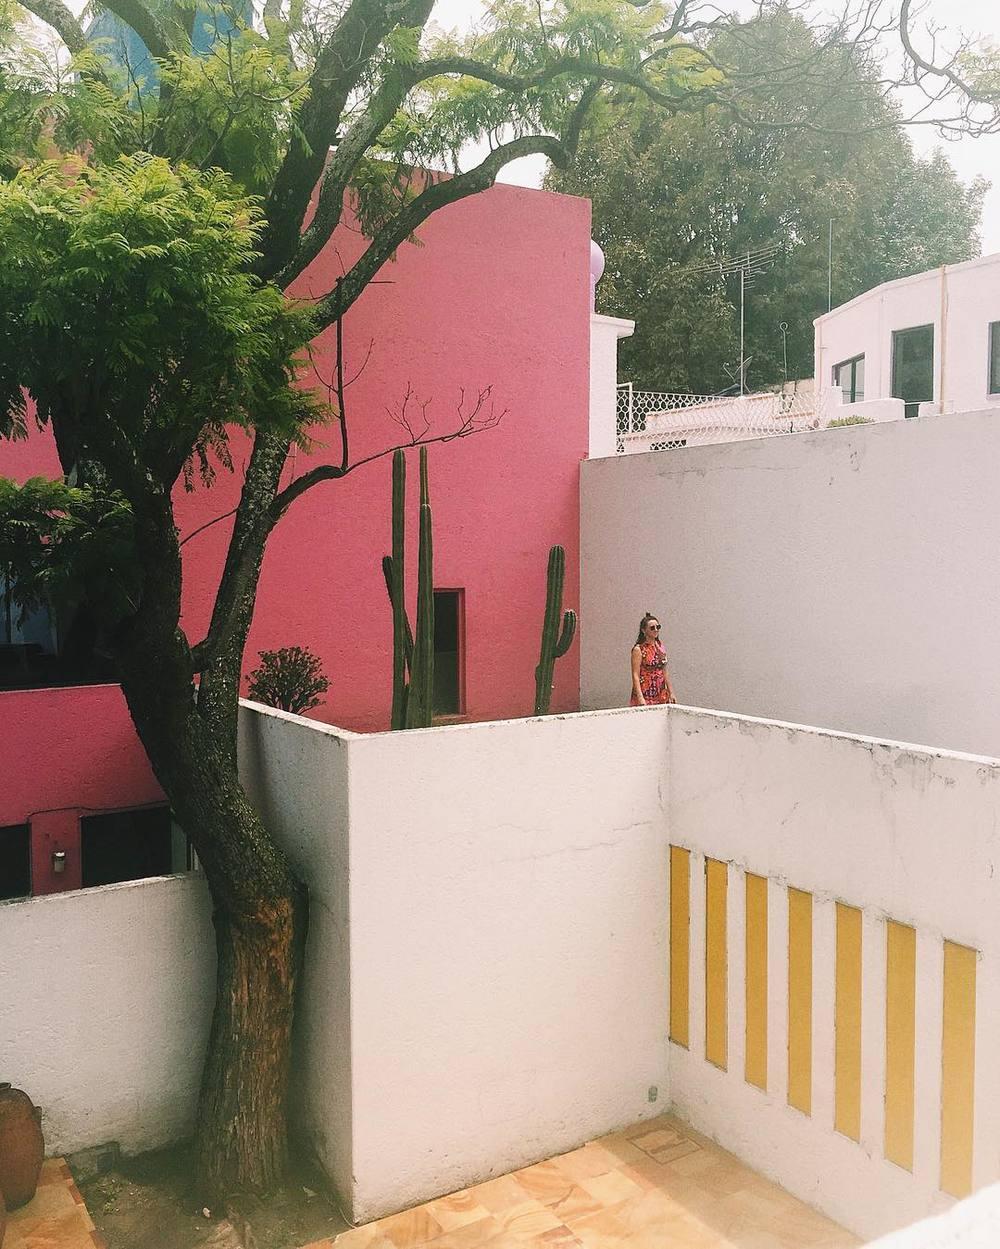 Color Love | The Trifecta | Mustard, Blush + Dew | www.foundandkept.com